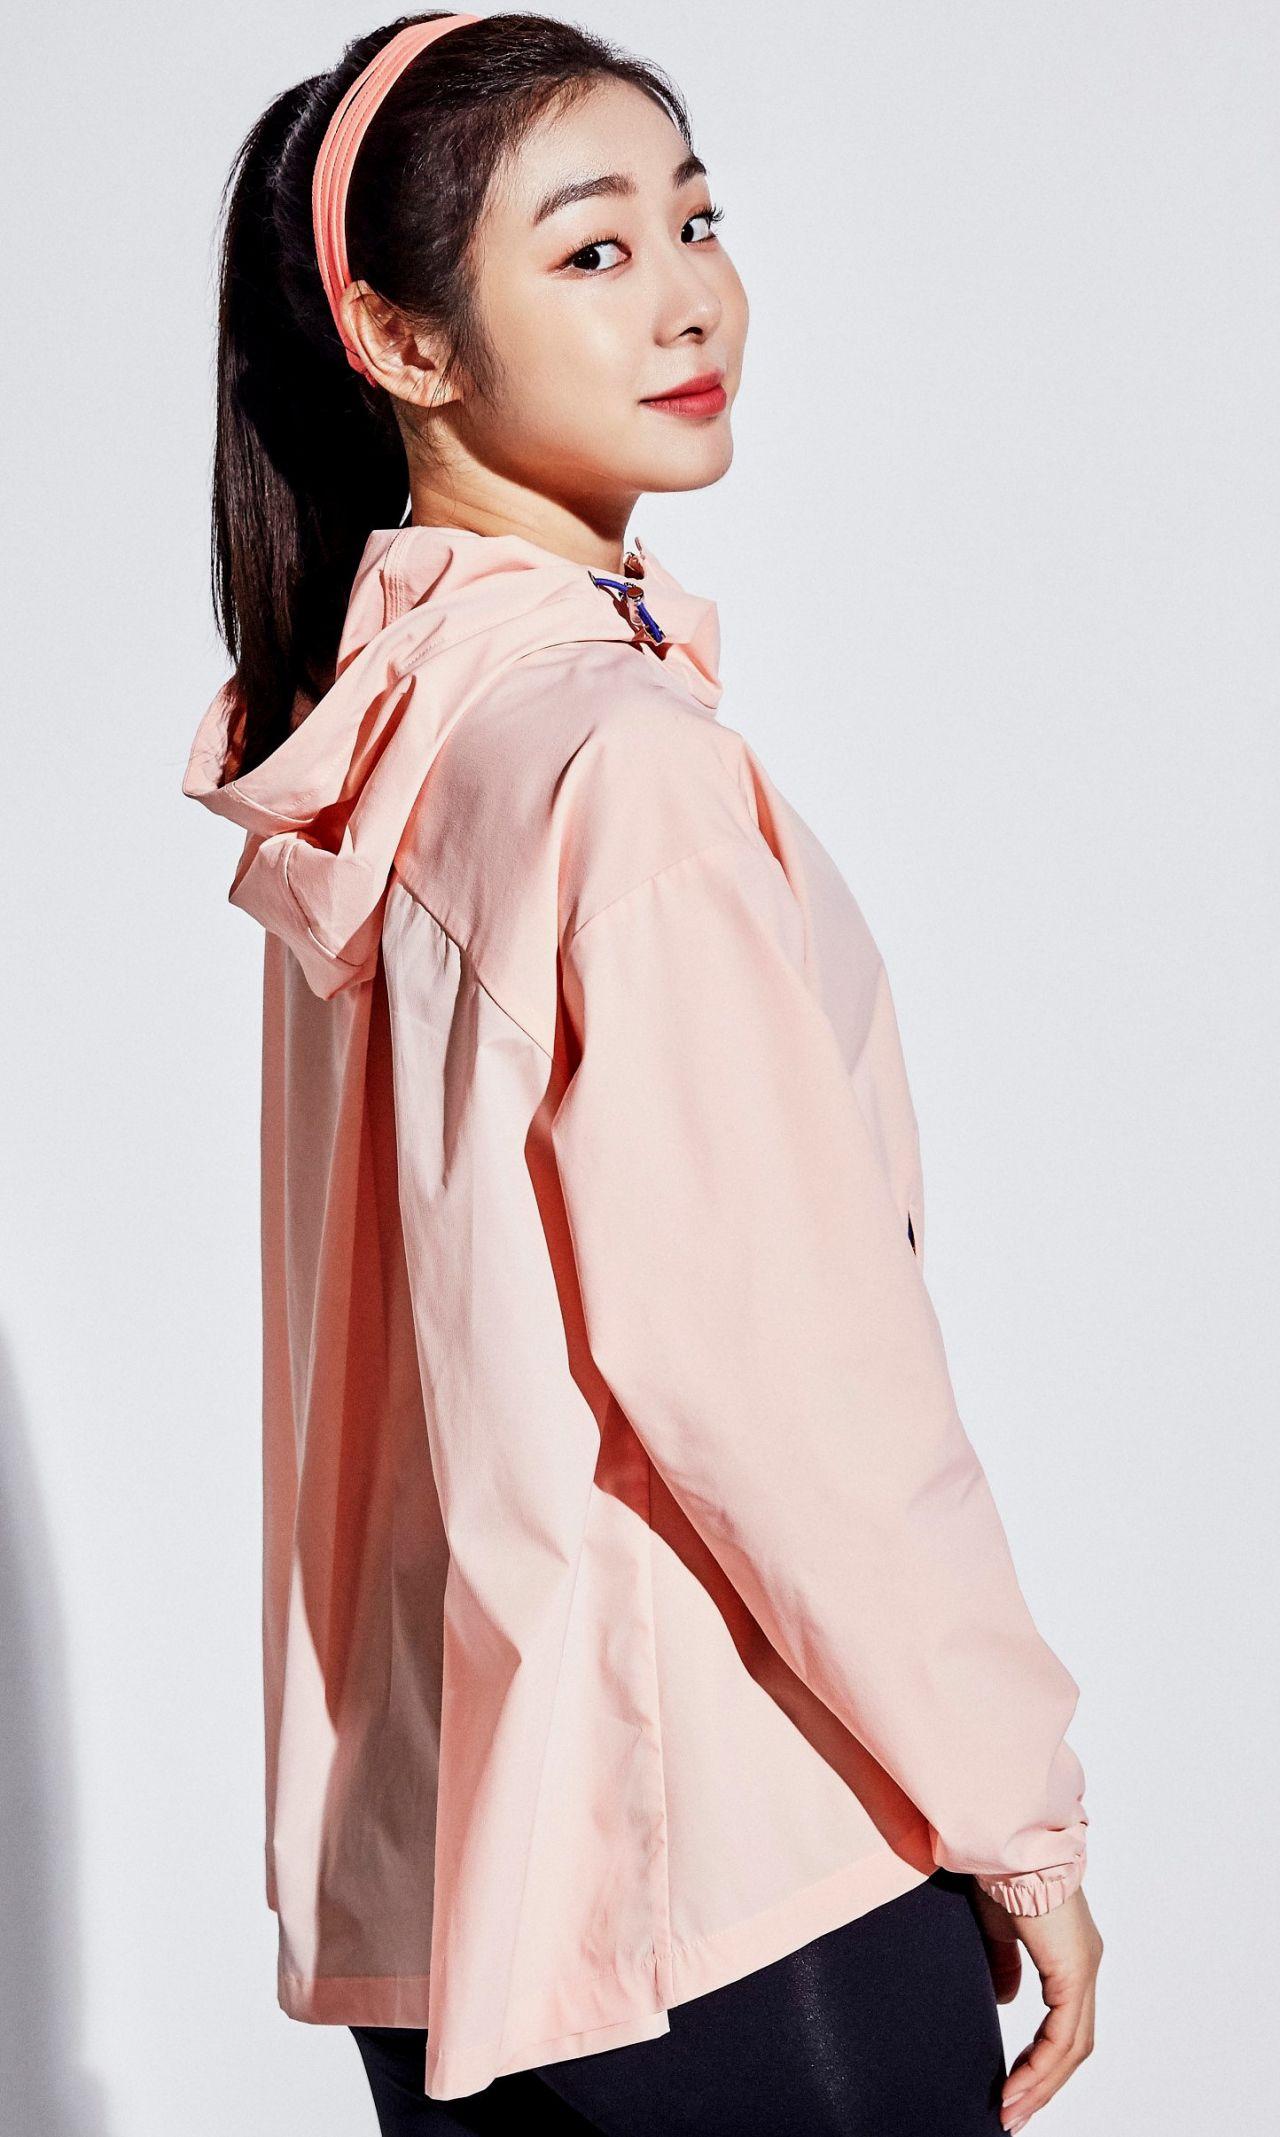 Yuna Kim - Photoshoot for New Balance S/S 2019 • CelebMafia